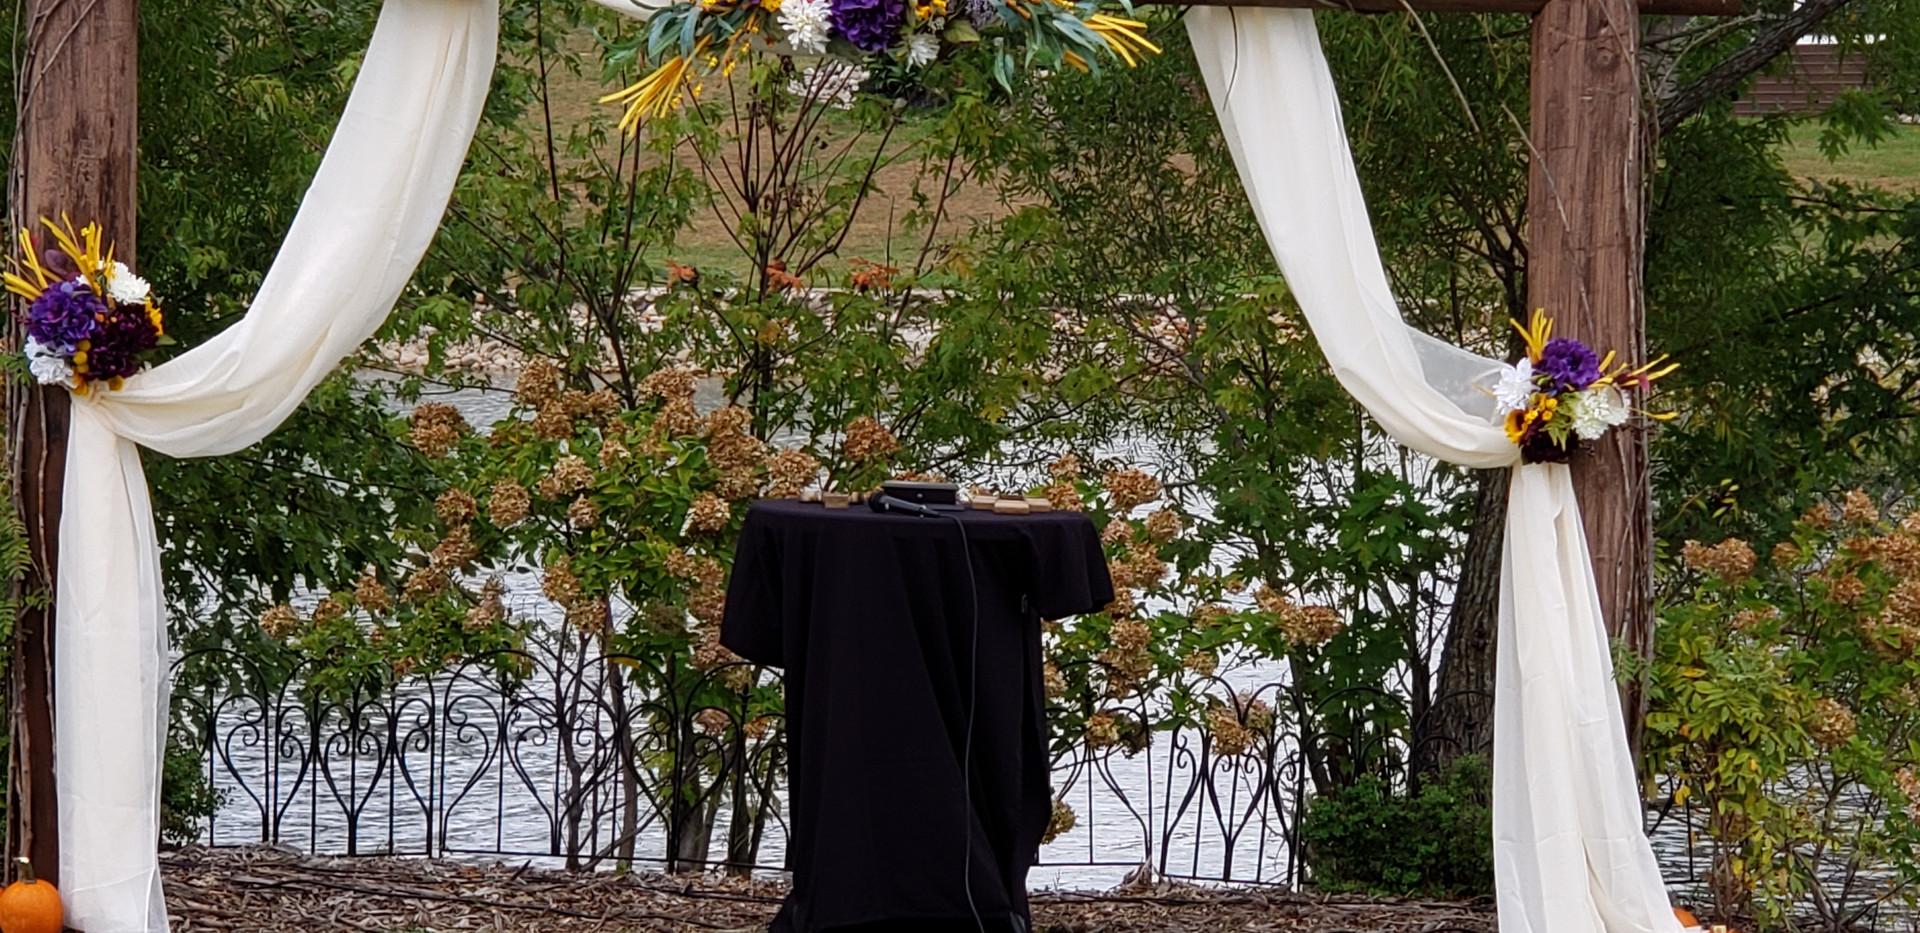 1. Side Pull Arch drape